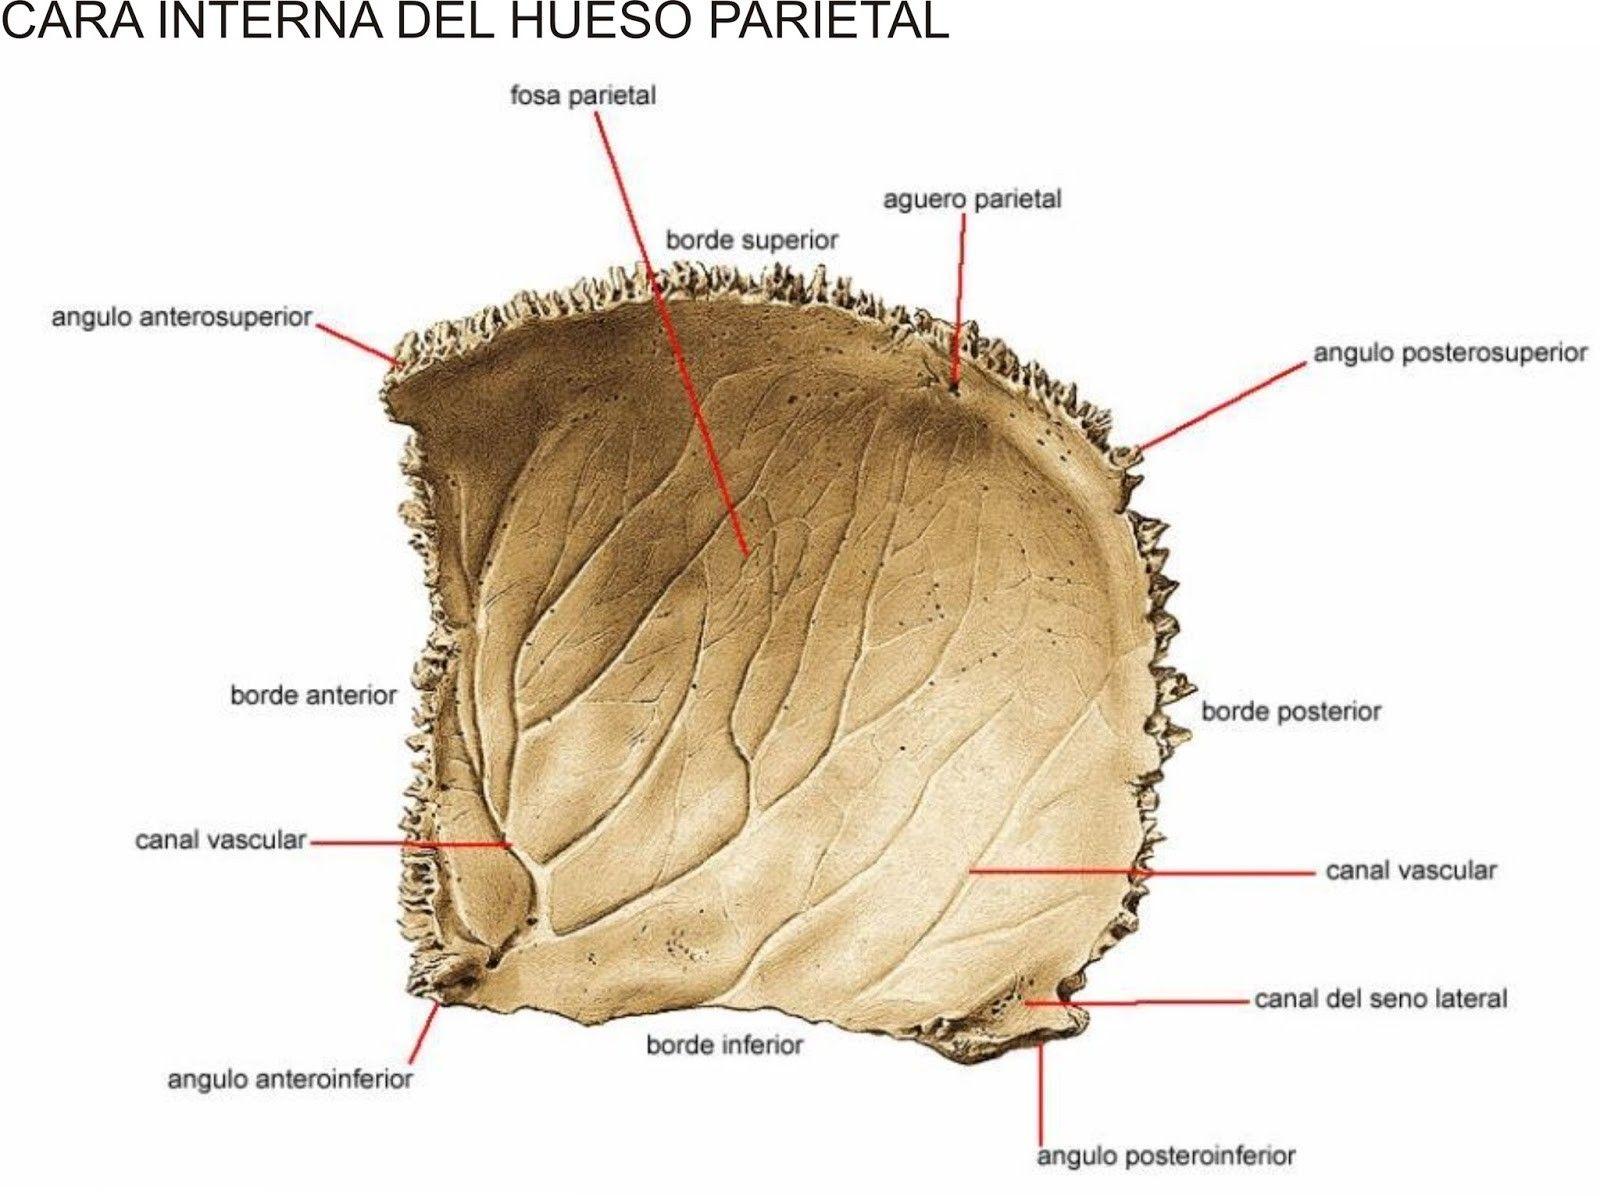 HUESO PARIETAL ANATOMIA PDF DOWNLOAD